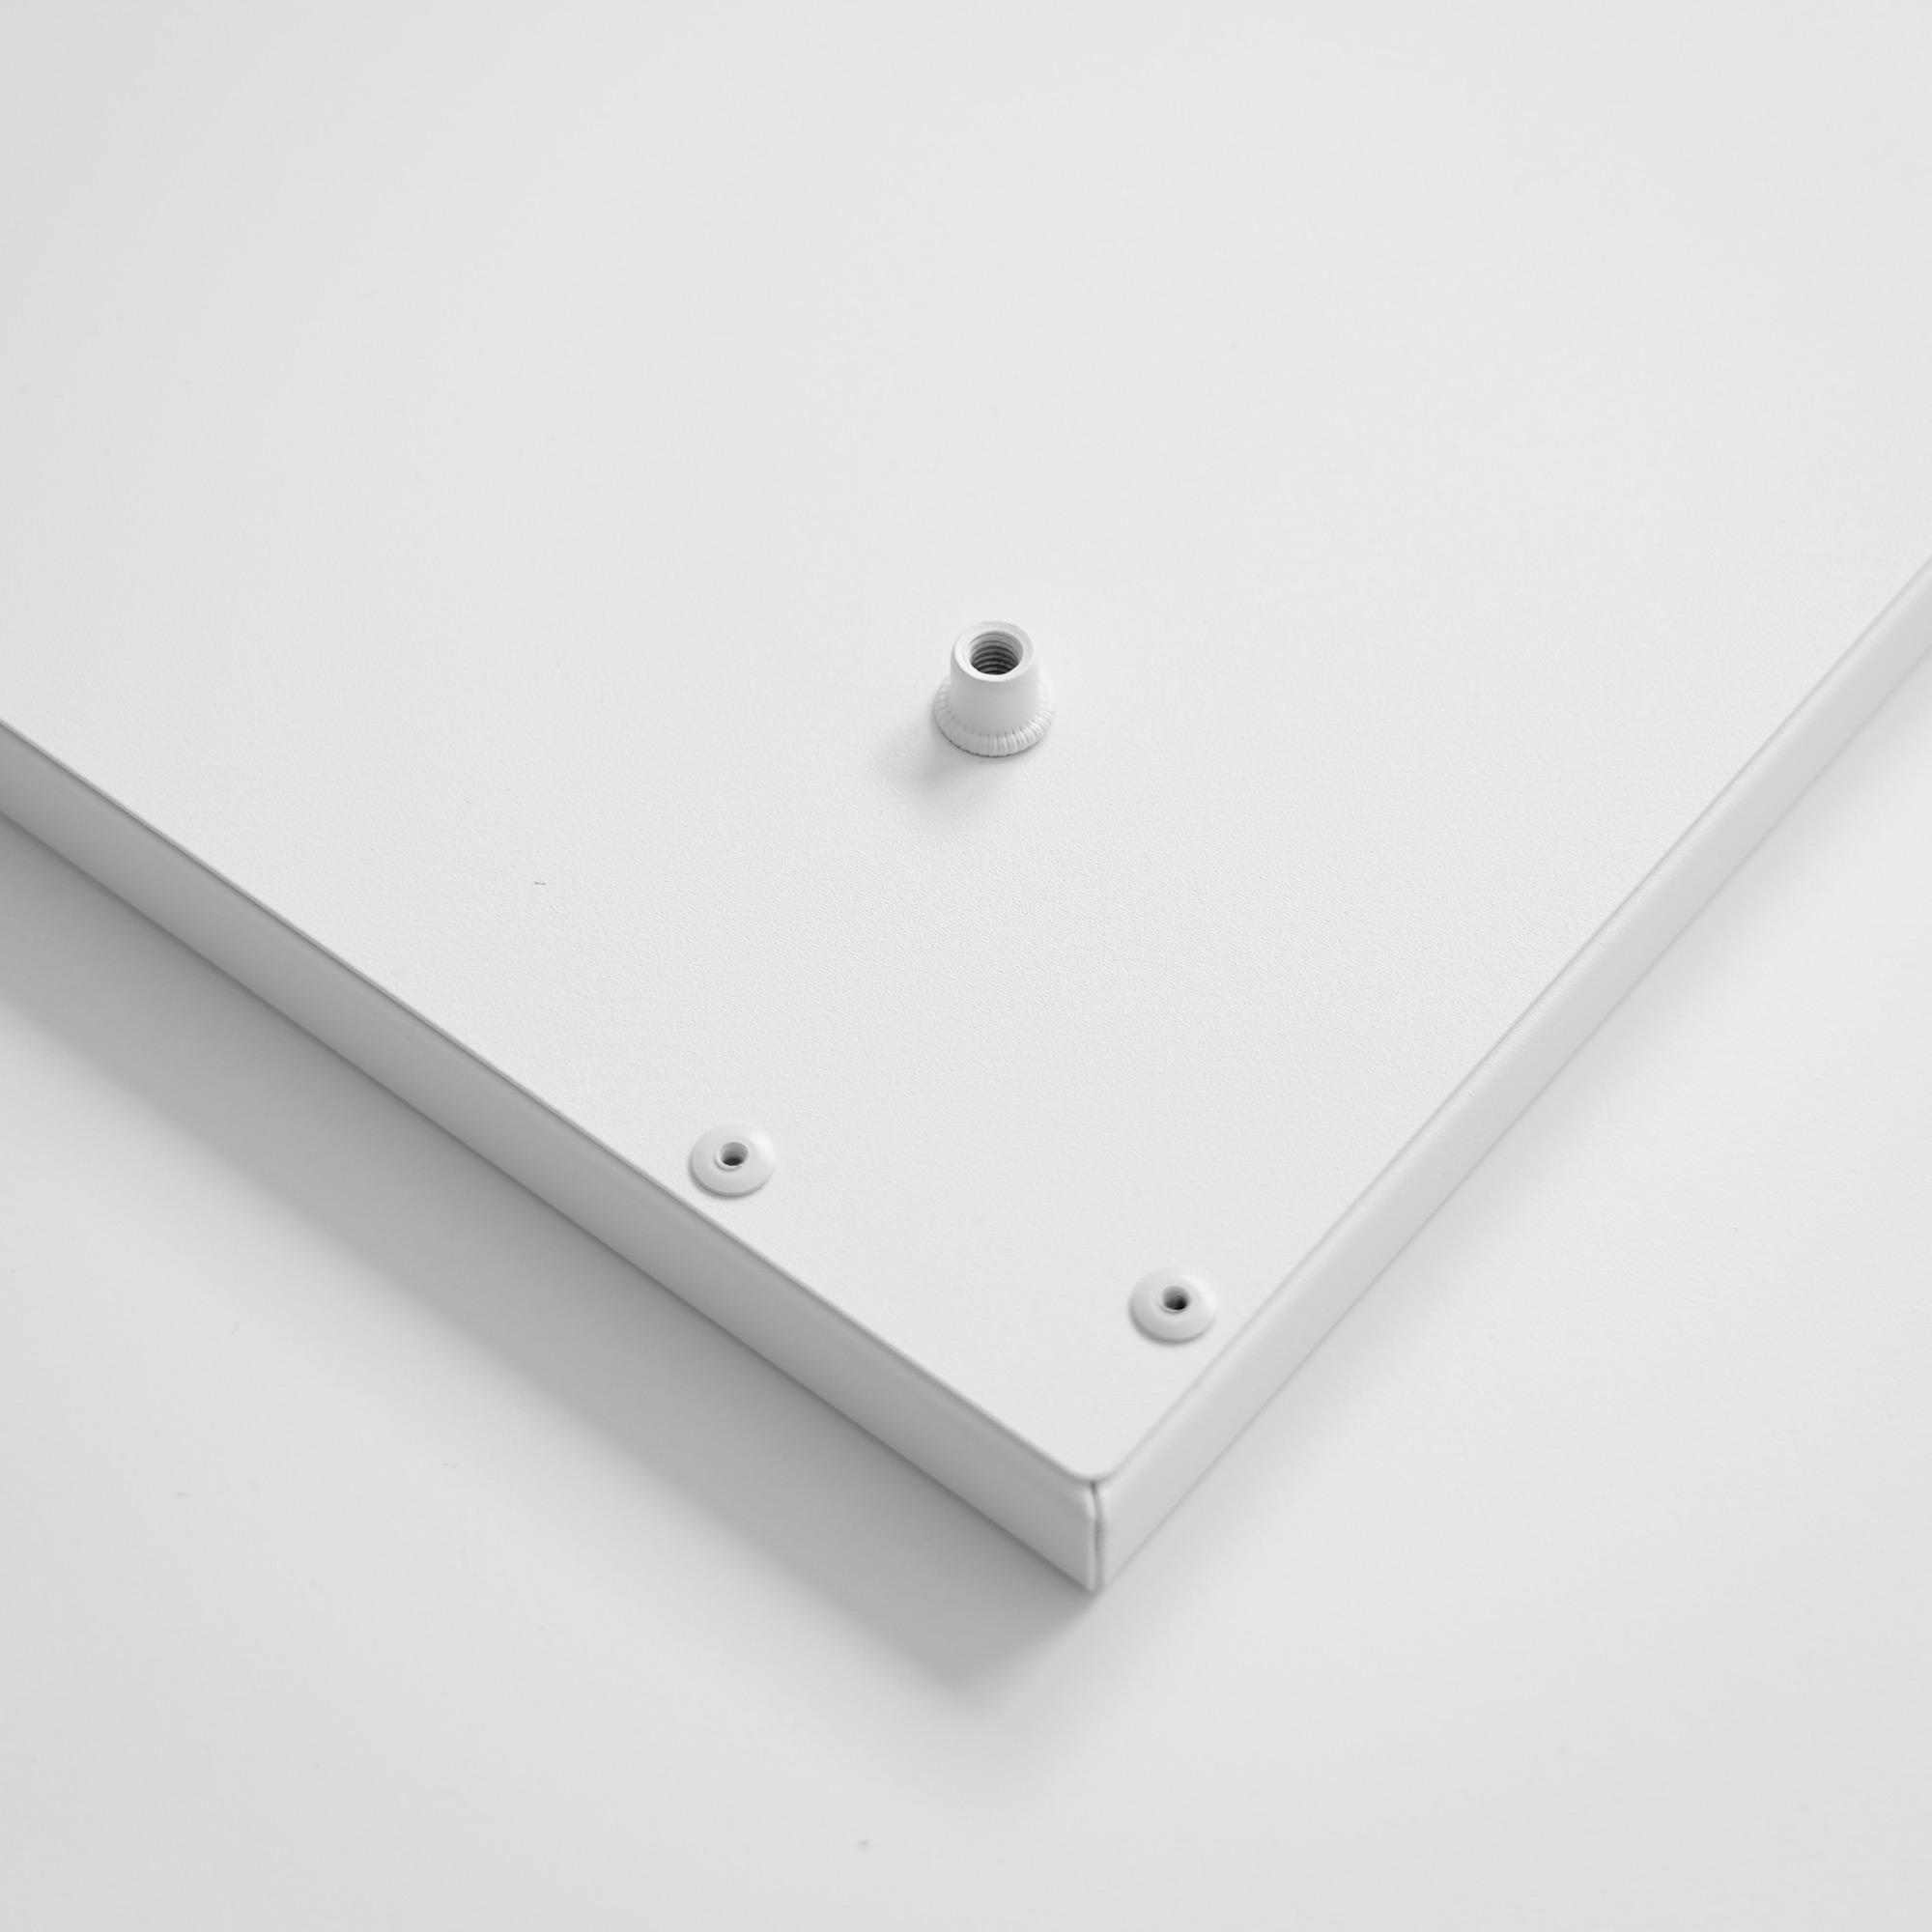 Ideal-ceiling-tile-heater-for-public-commercial-buildings